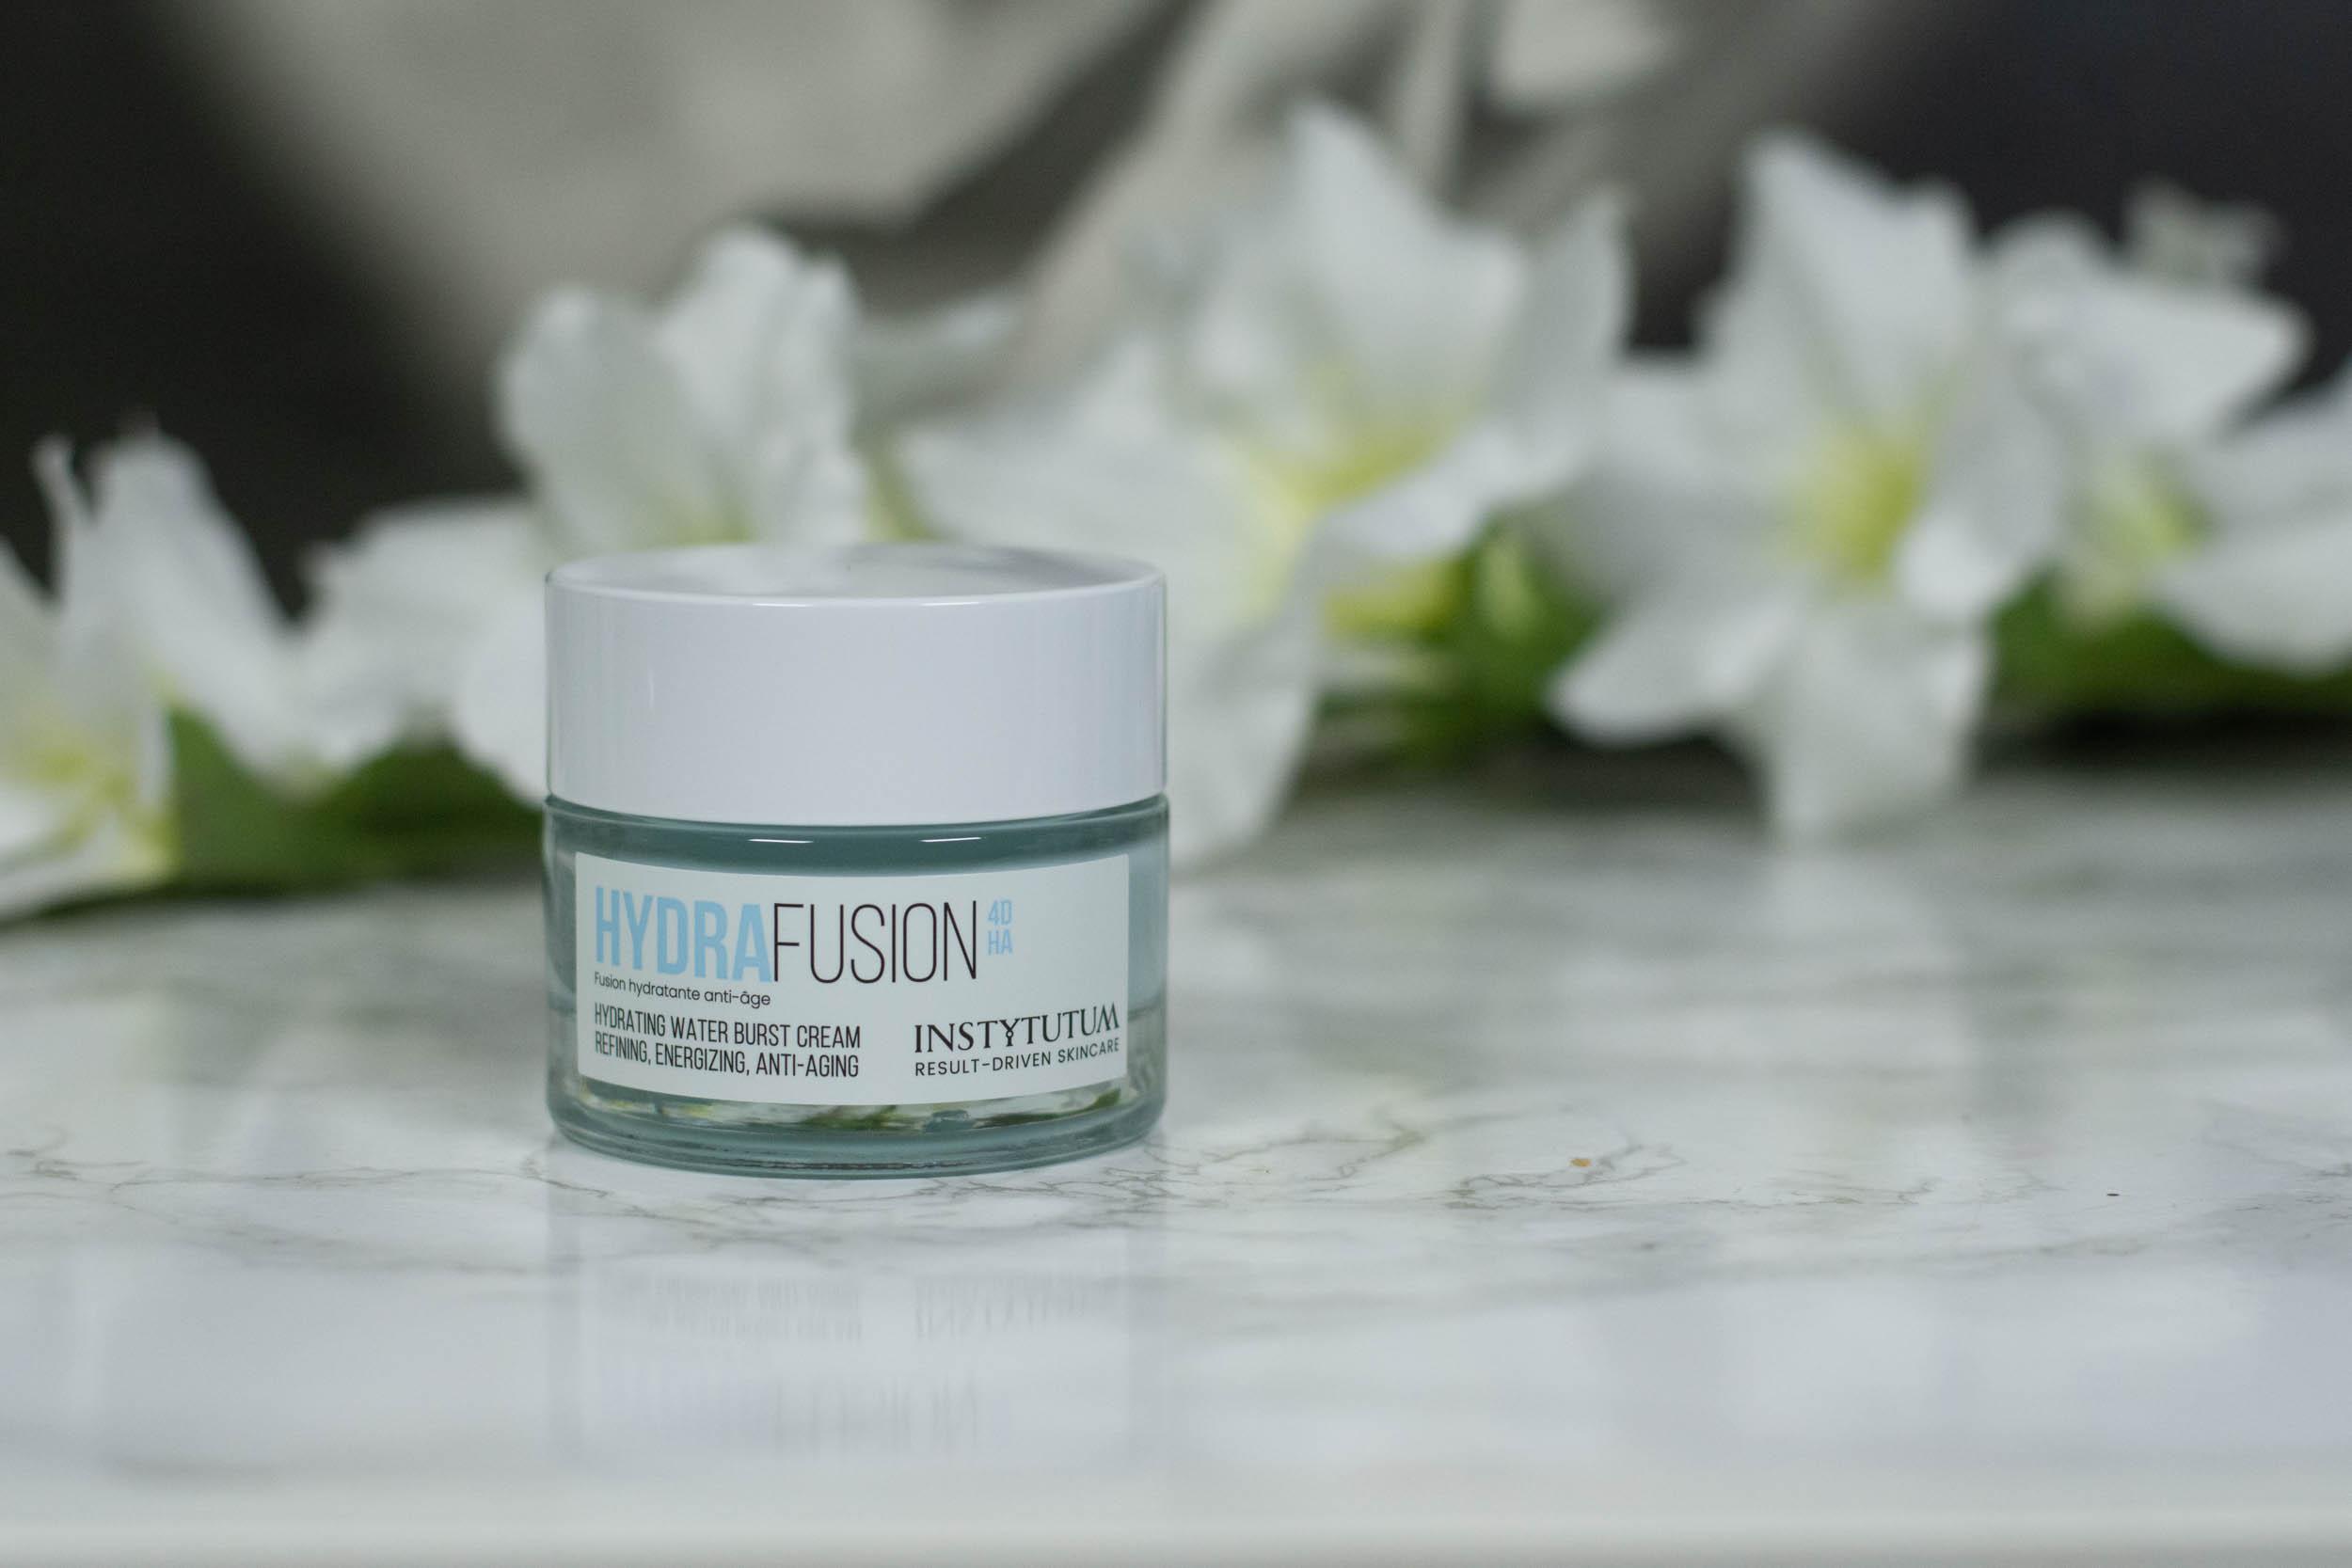 Instytutum Hydrafusion Water Burst Cream Review